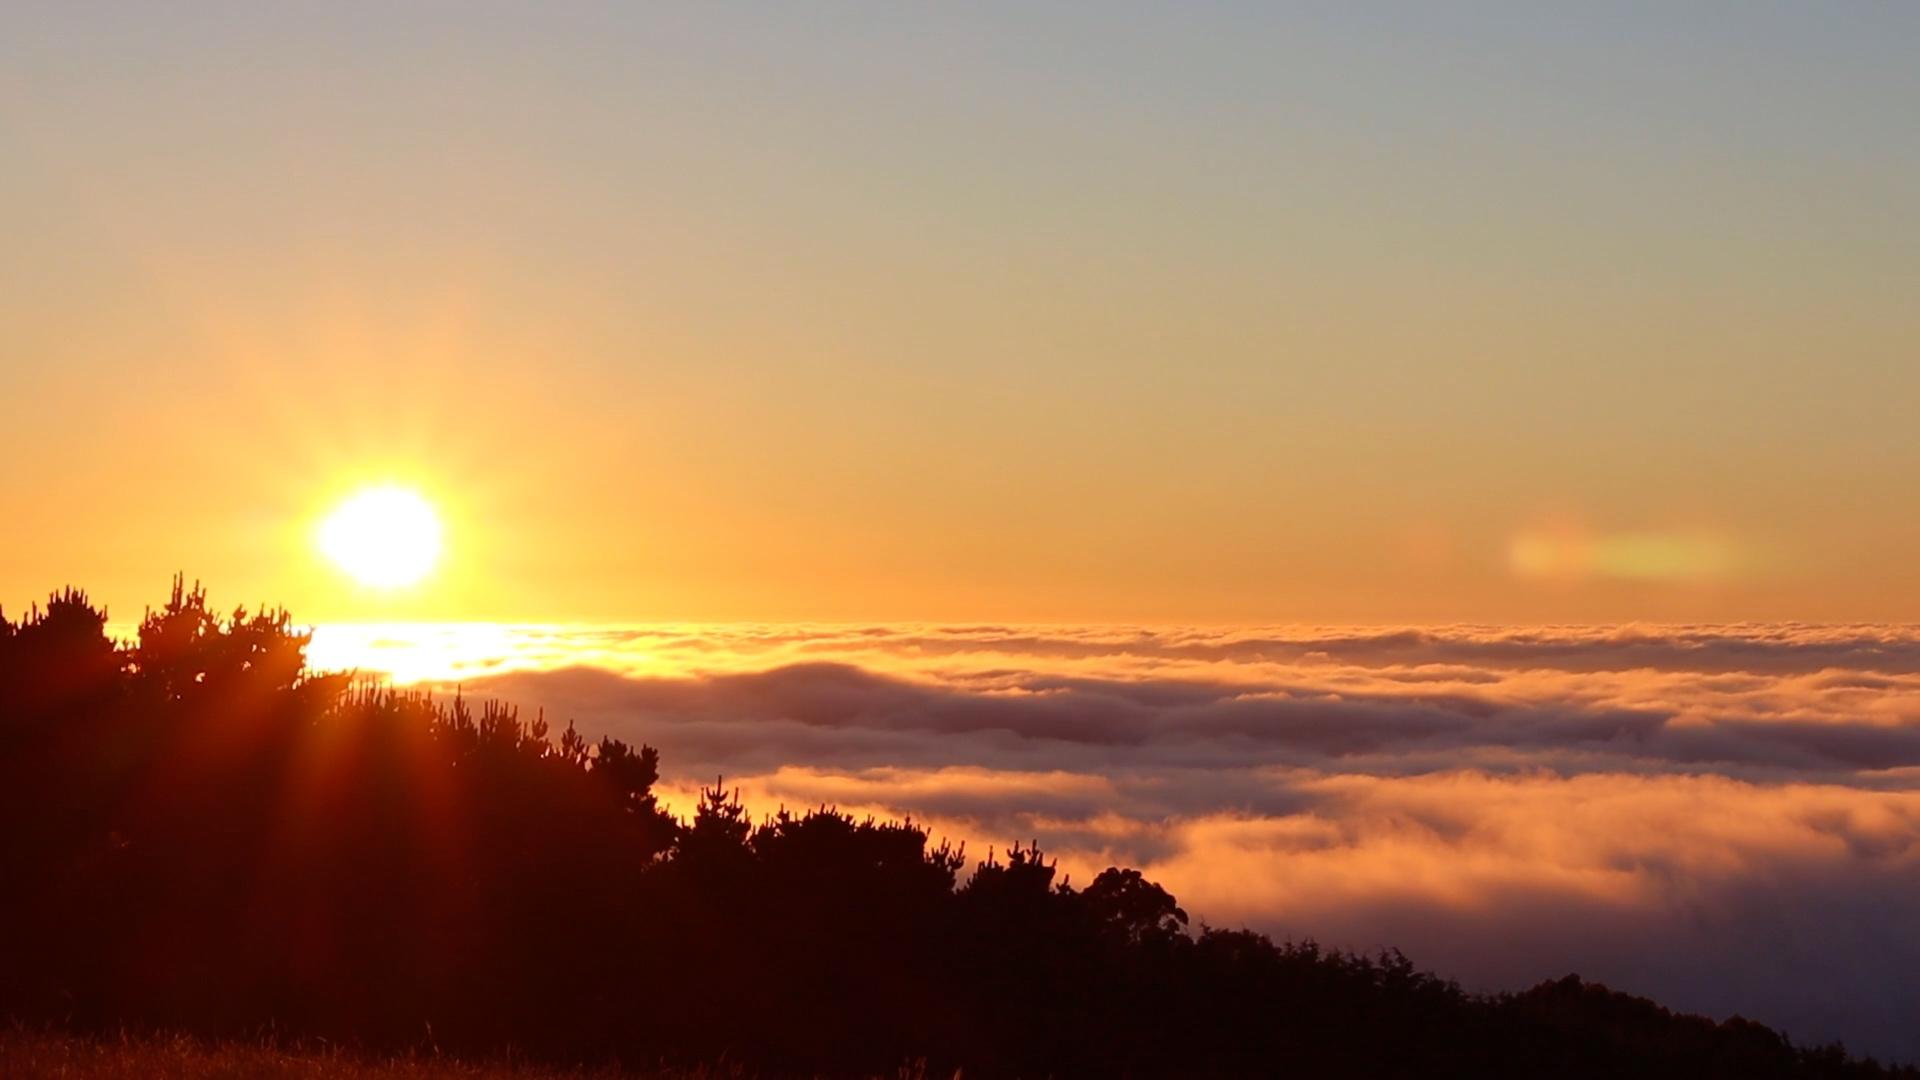 Studio Garden View of Cloudy Morning